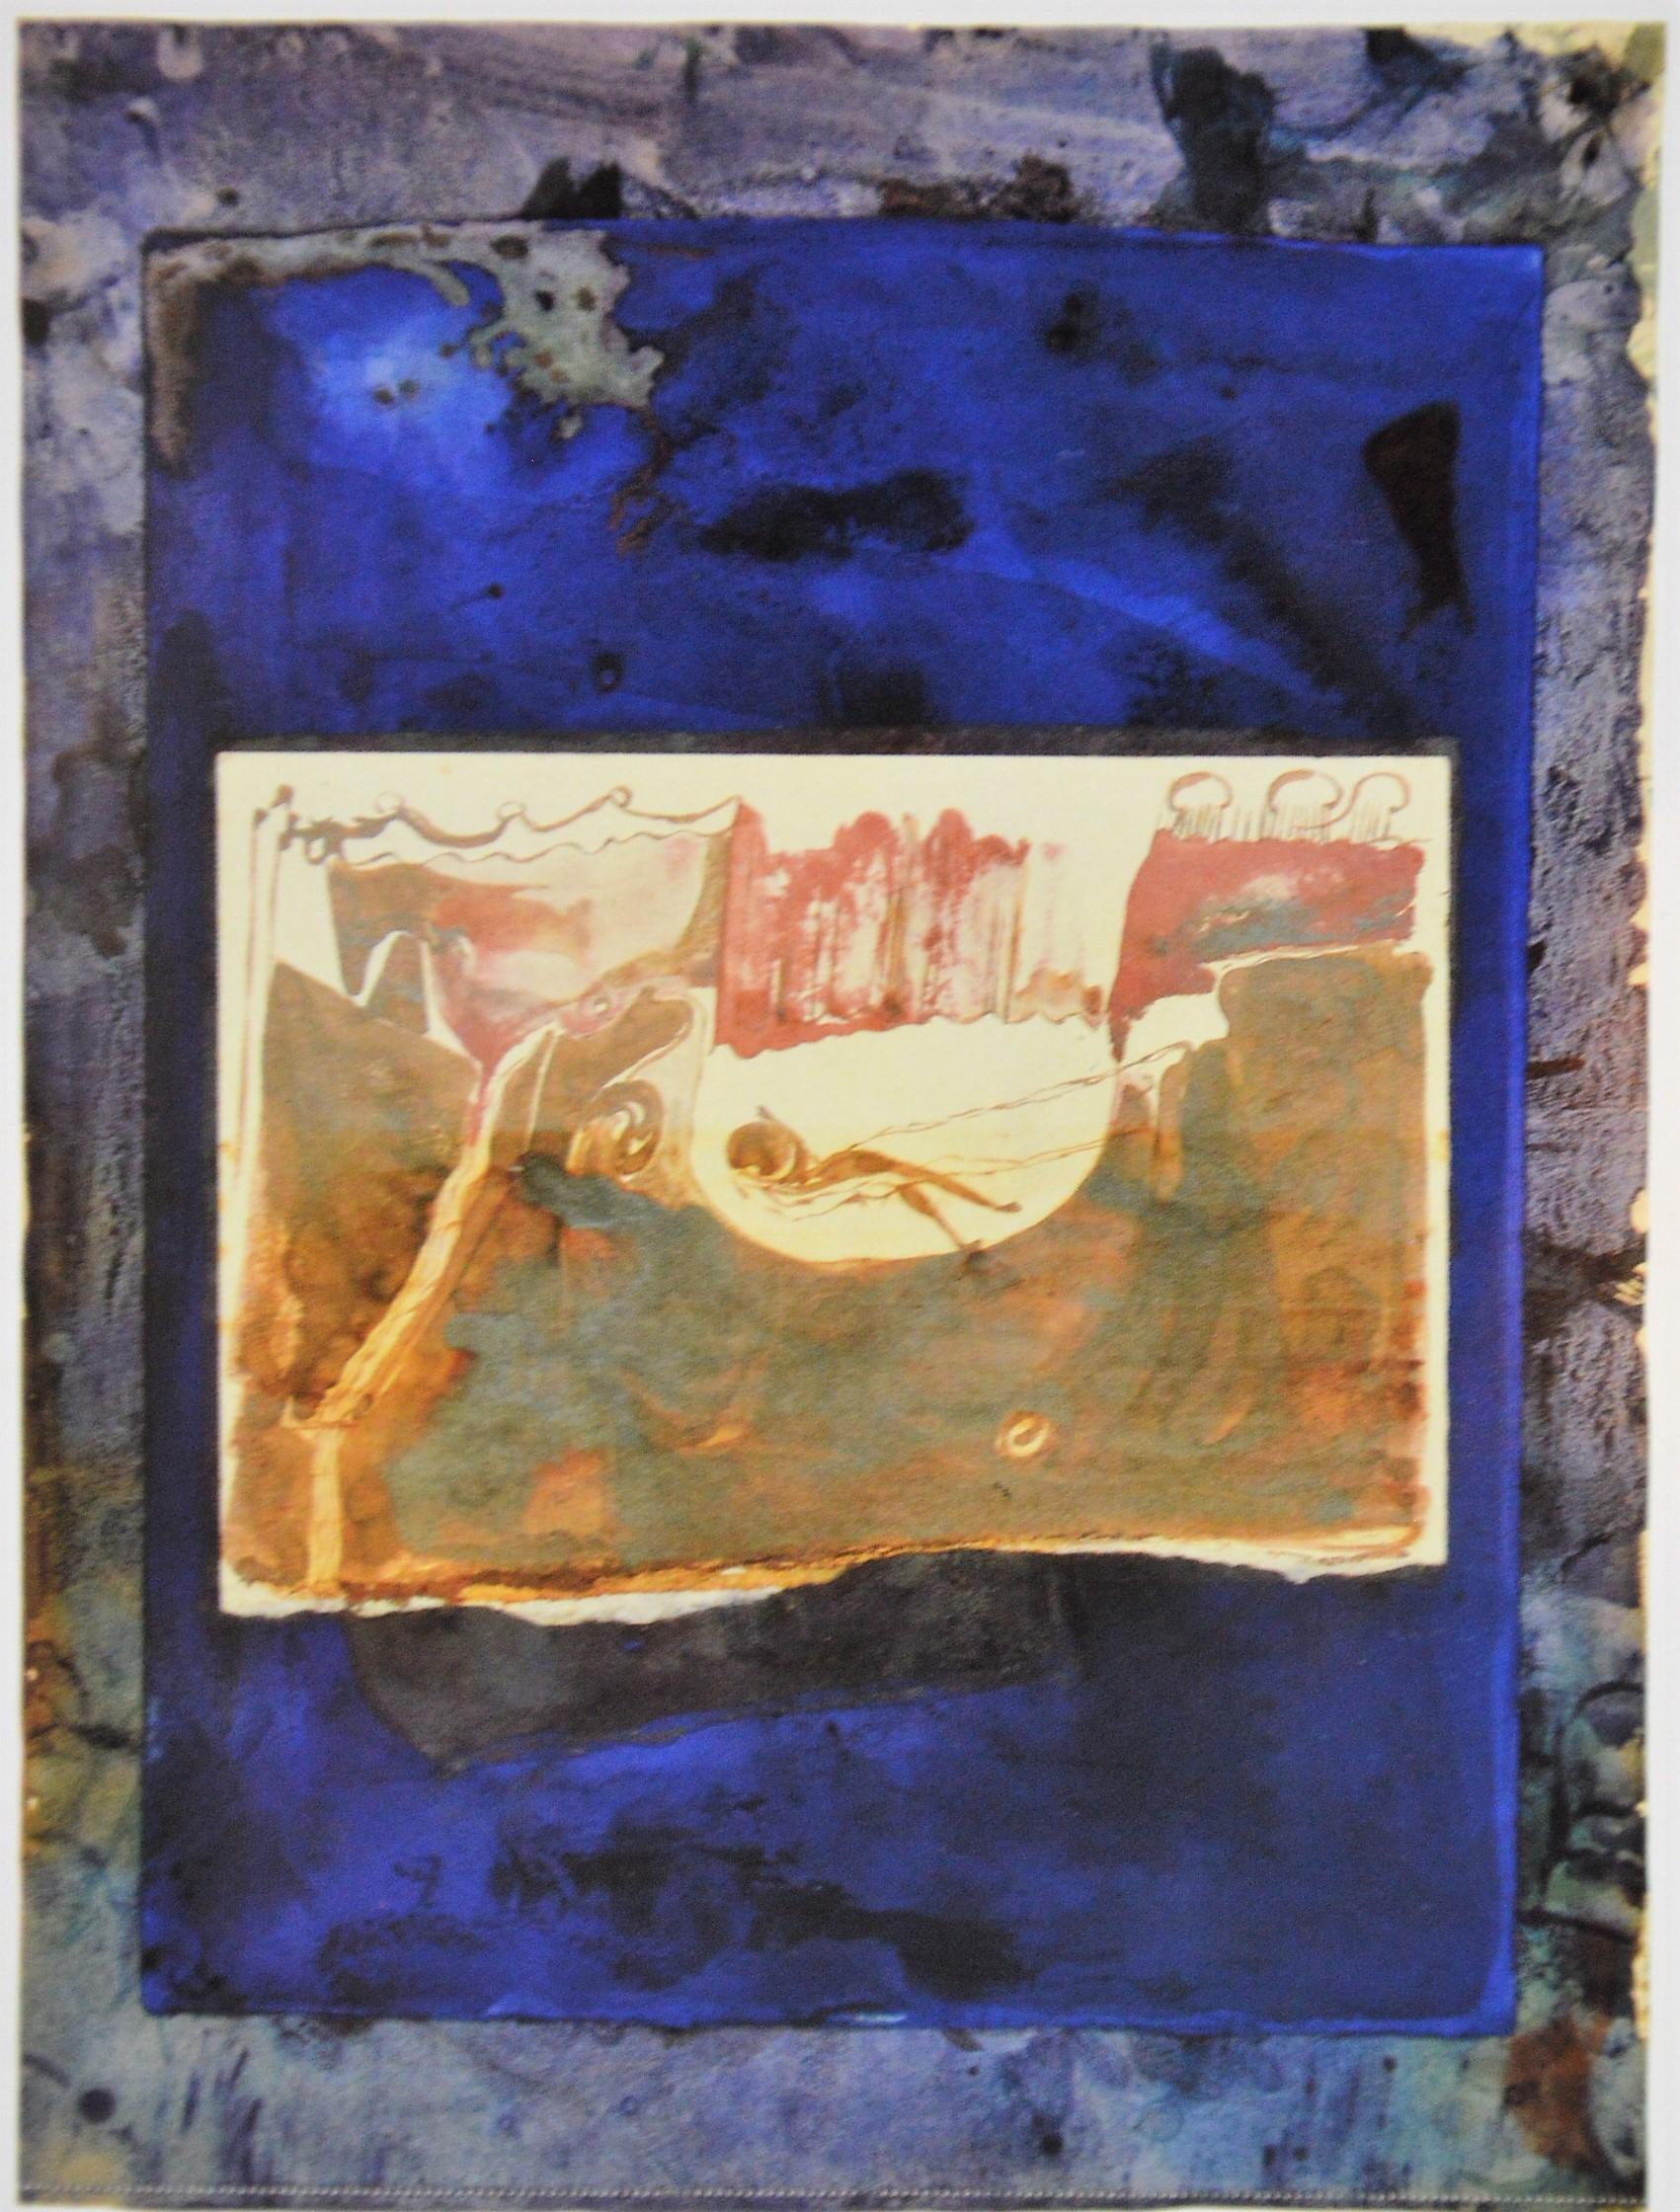 Joseph Beuys . Before the bird, 1950